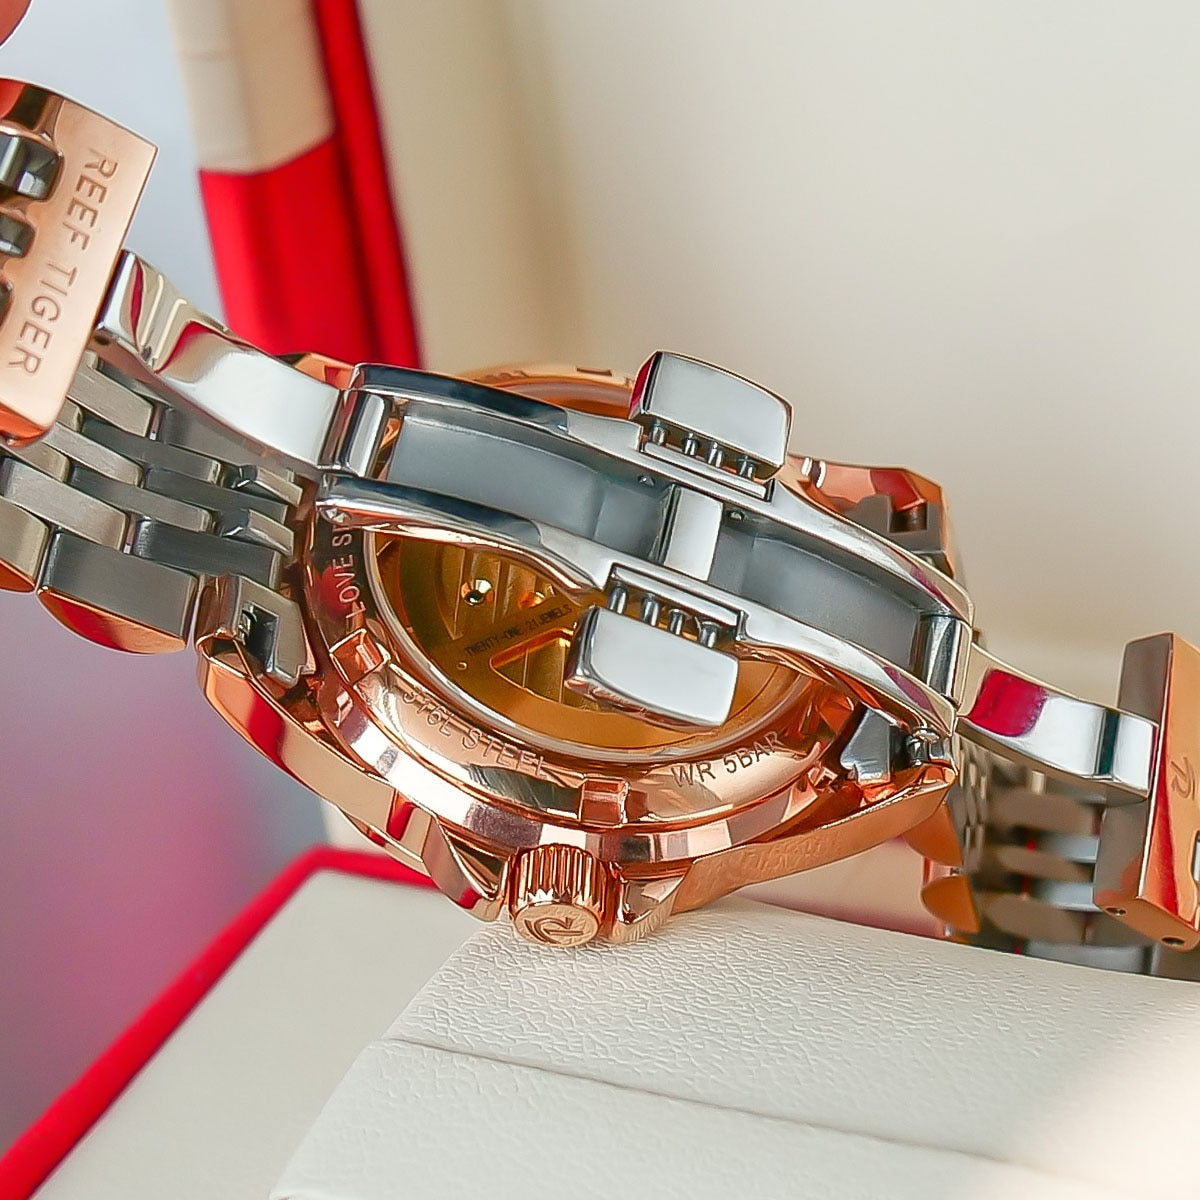 2021 Reef Tiger Top Brand Lady Watches Luxury Flower Diamond Women Rose Gold Bracelet Automatic Watches Relogio Feminino RGA1583 enlarge